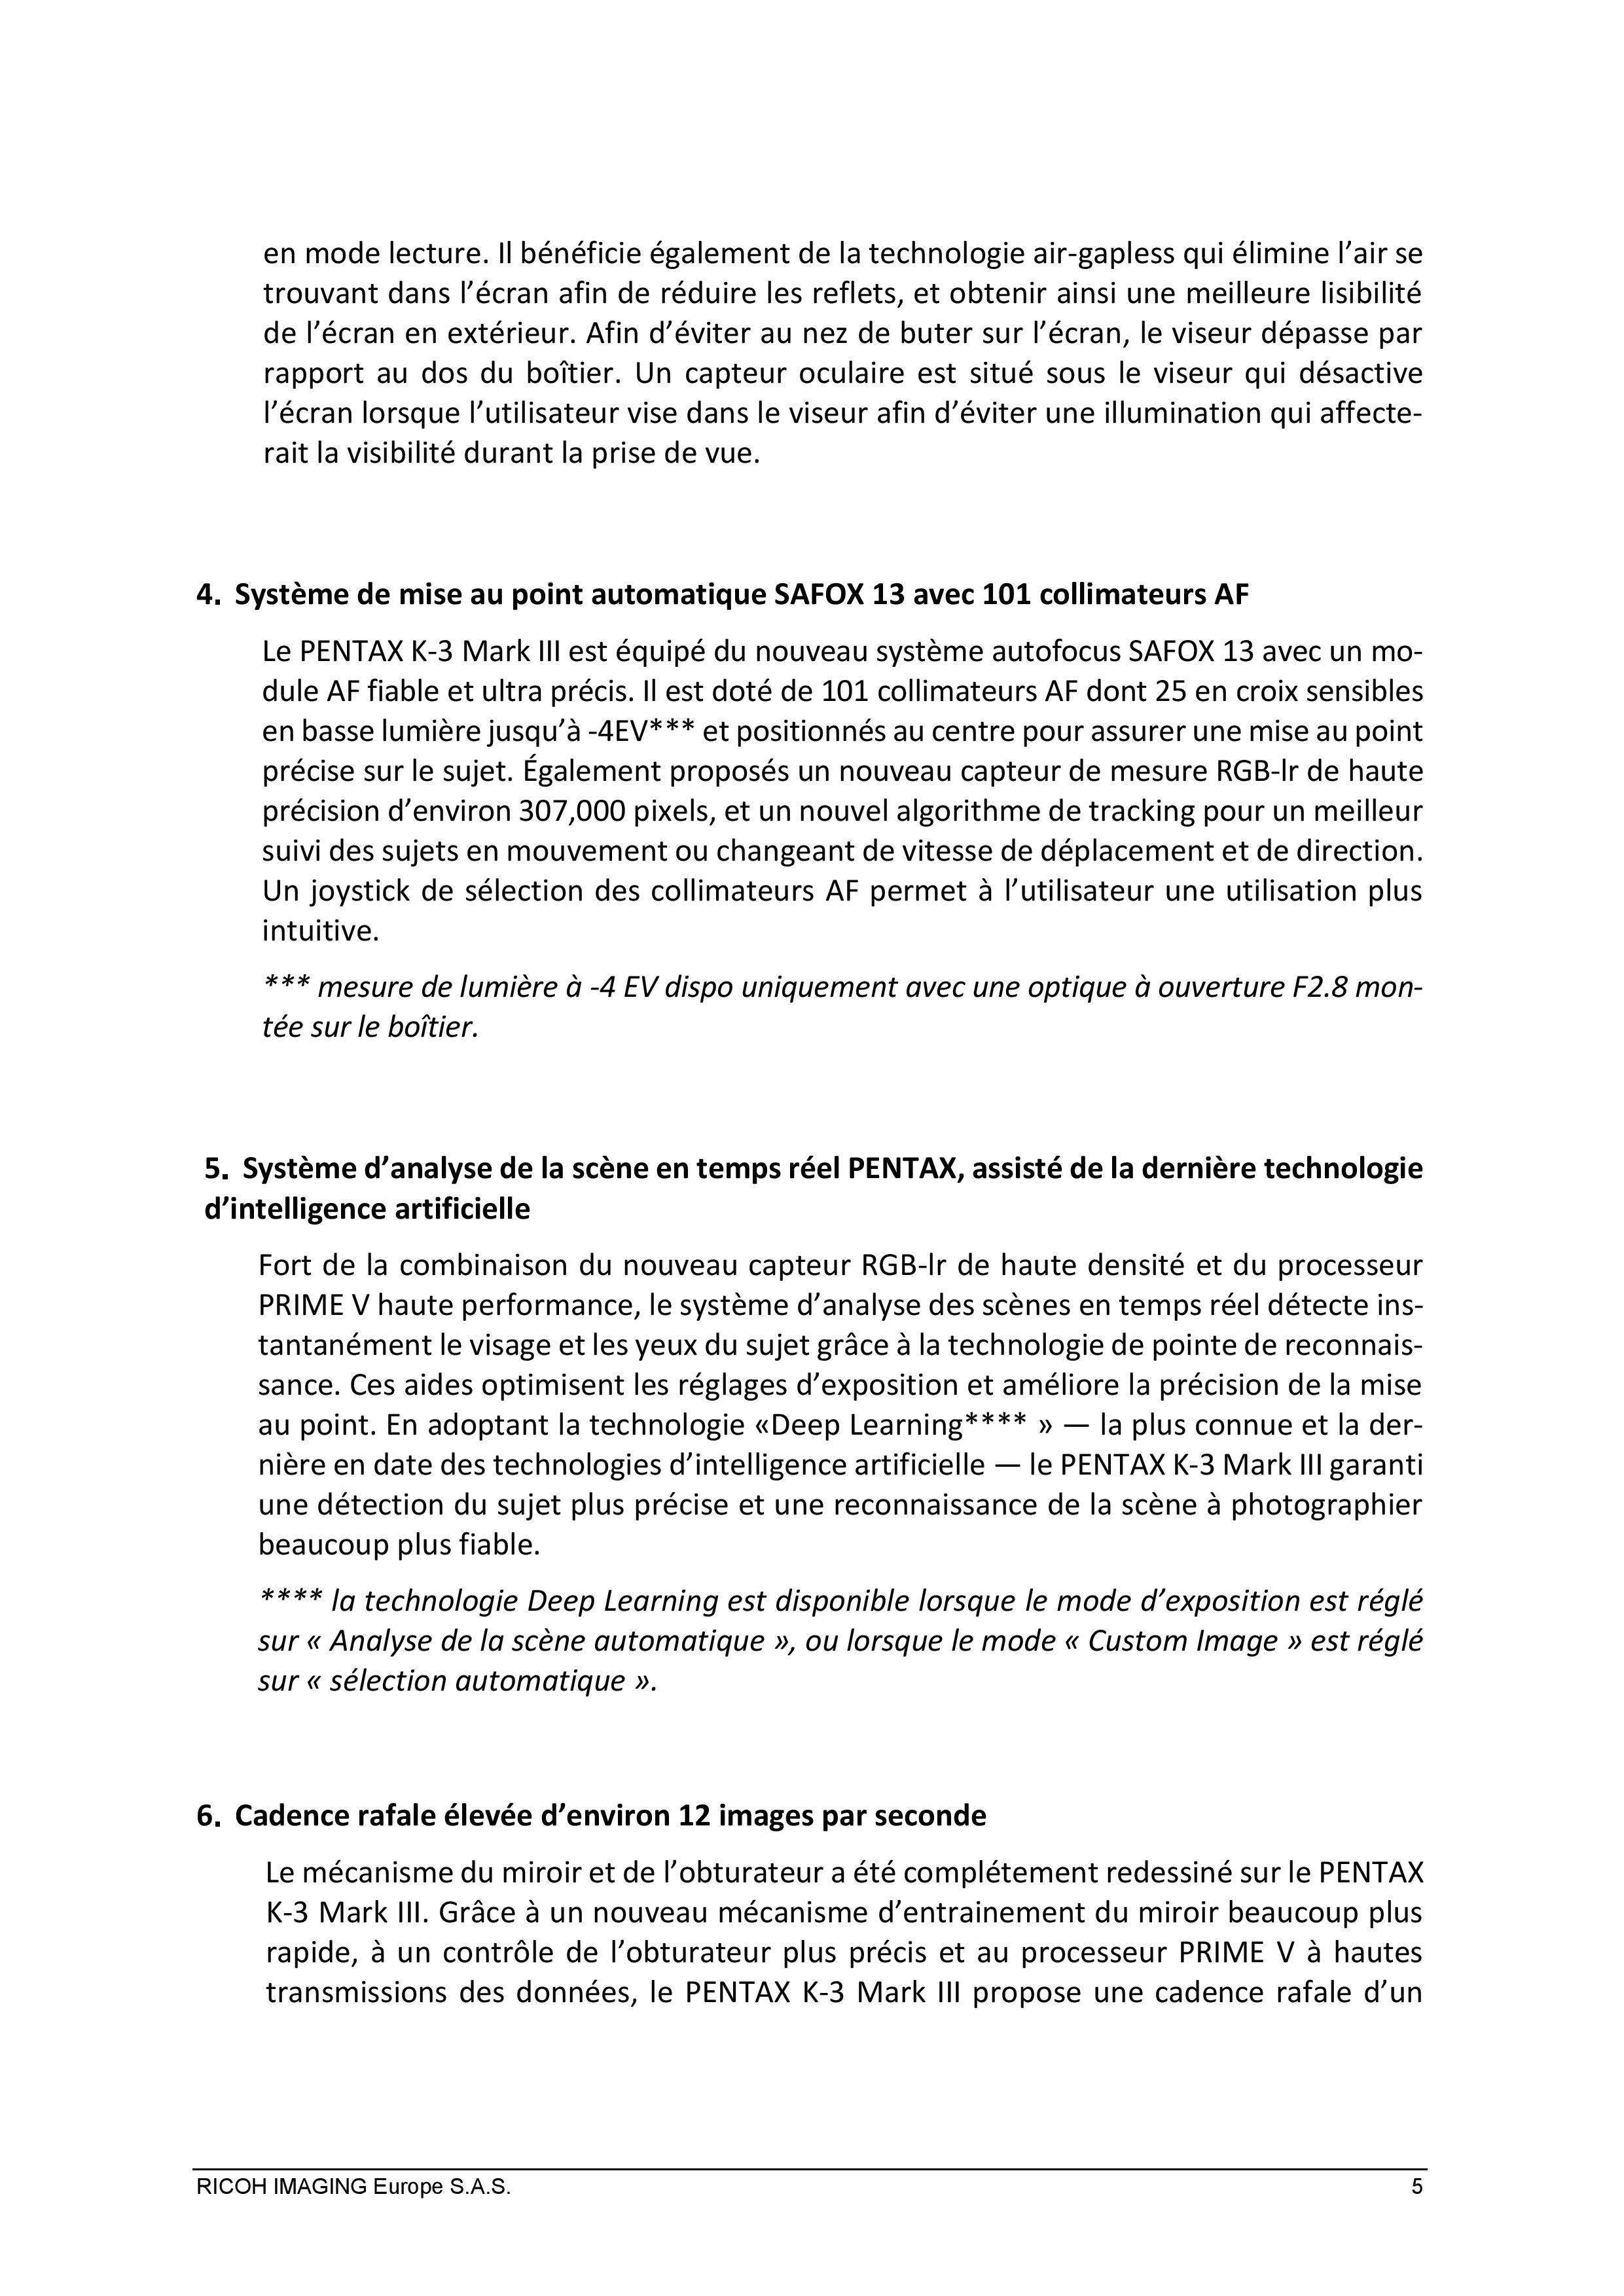 PENTAX RICOH IMAGING - Communiqué de presse du K3 Mark III 21033103143923142217344186